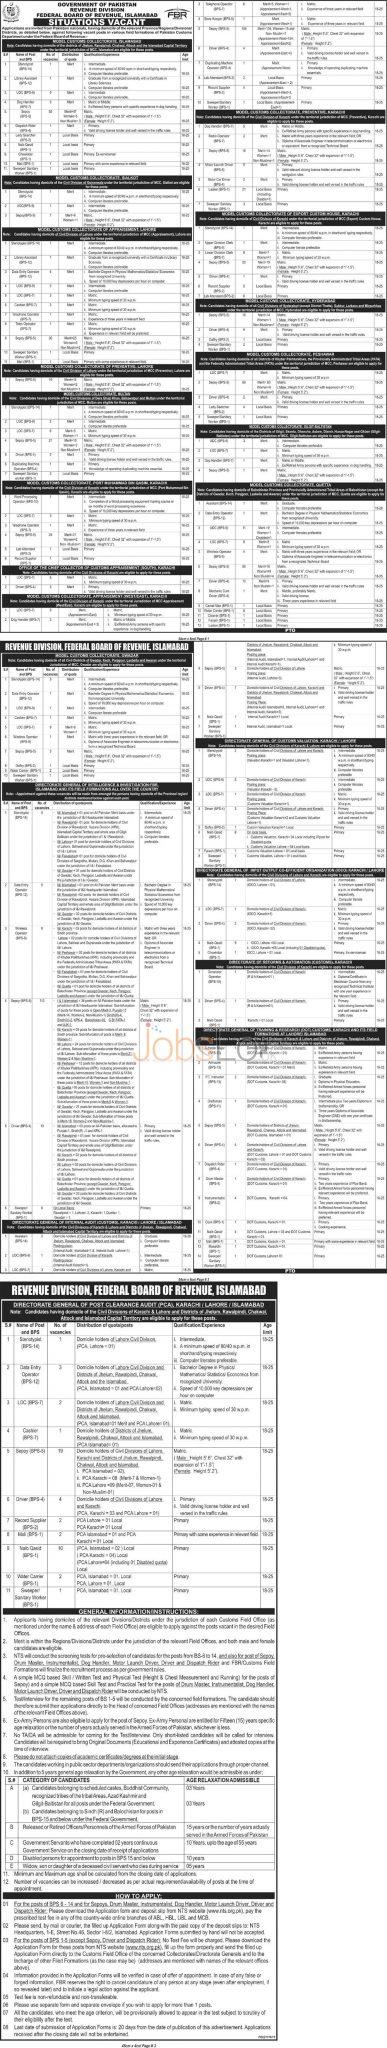 NTS FBR Jobs September 2015 Application Form Federal Board Revenue